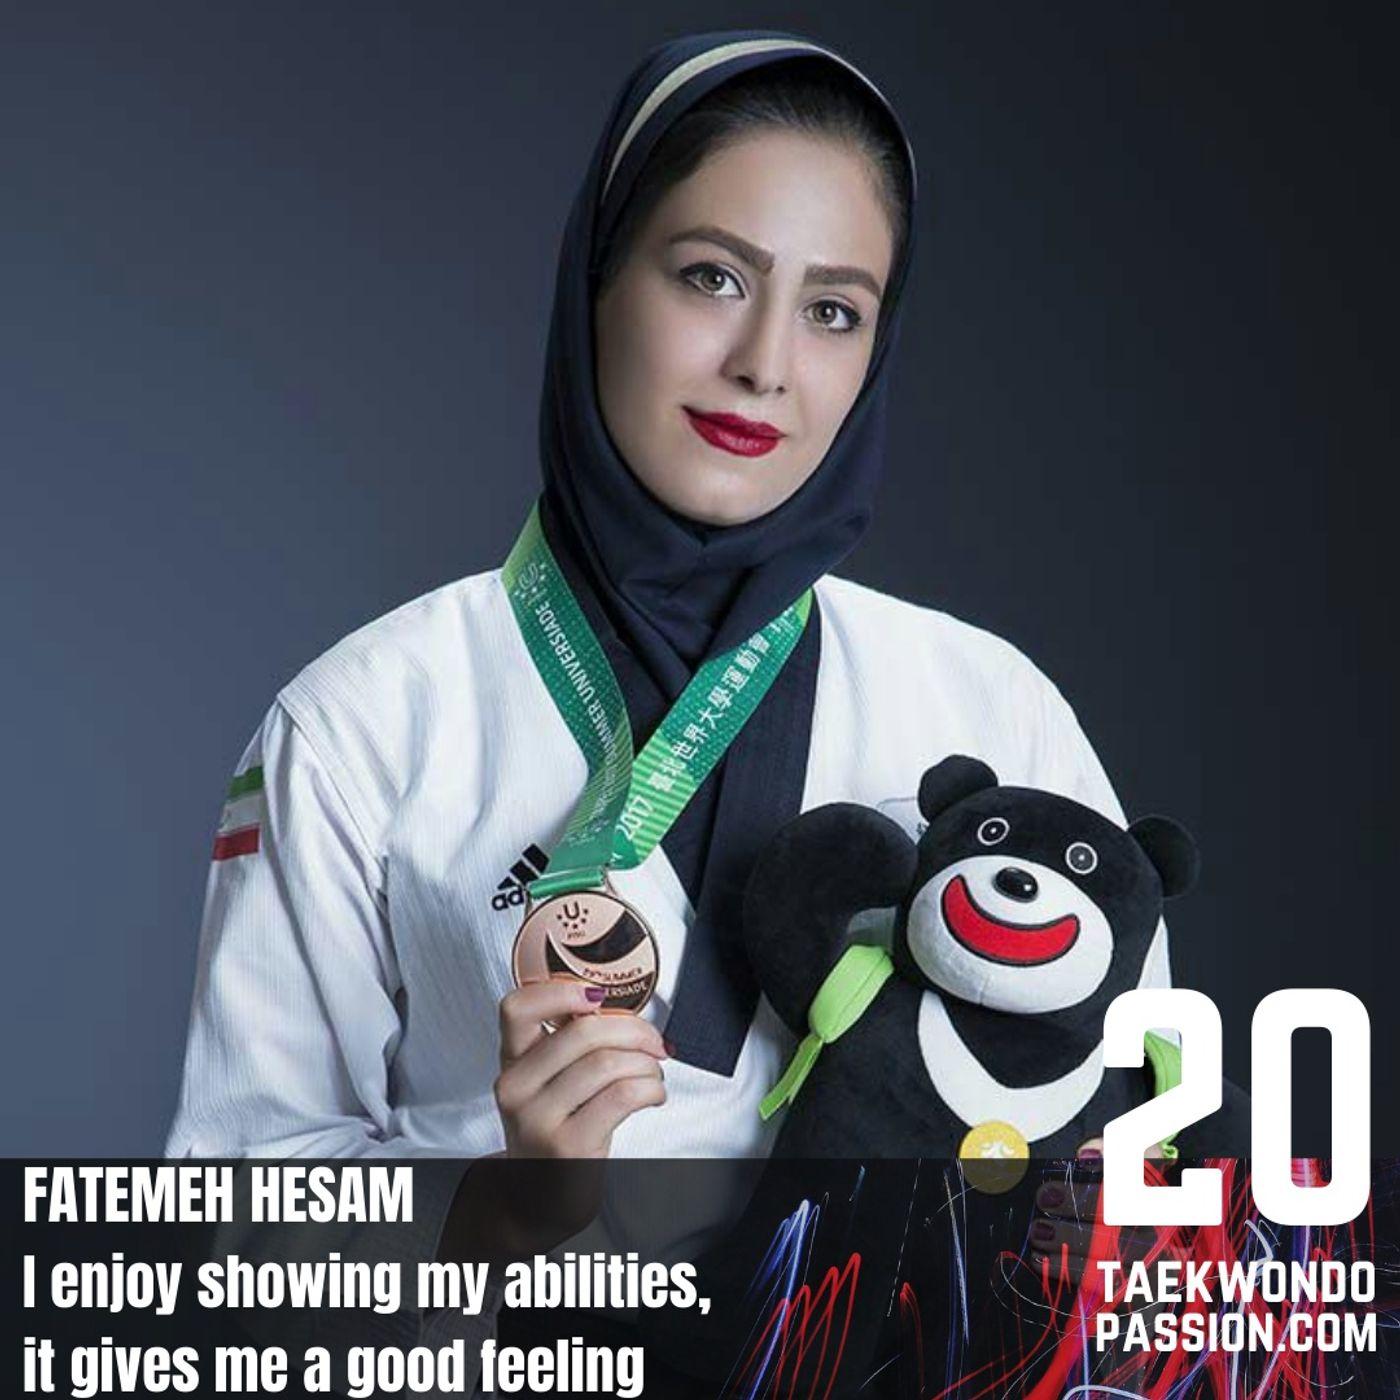 Fatemeh Hesam: I enjoy showing my abilities, it gives me a good feeling